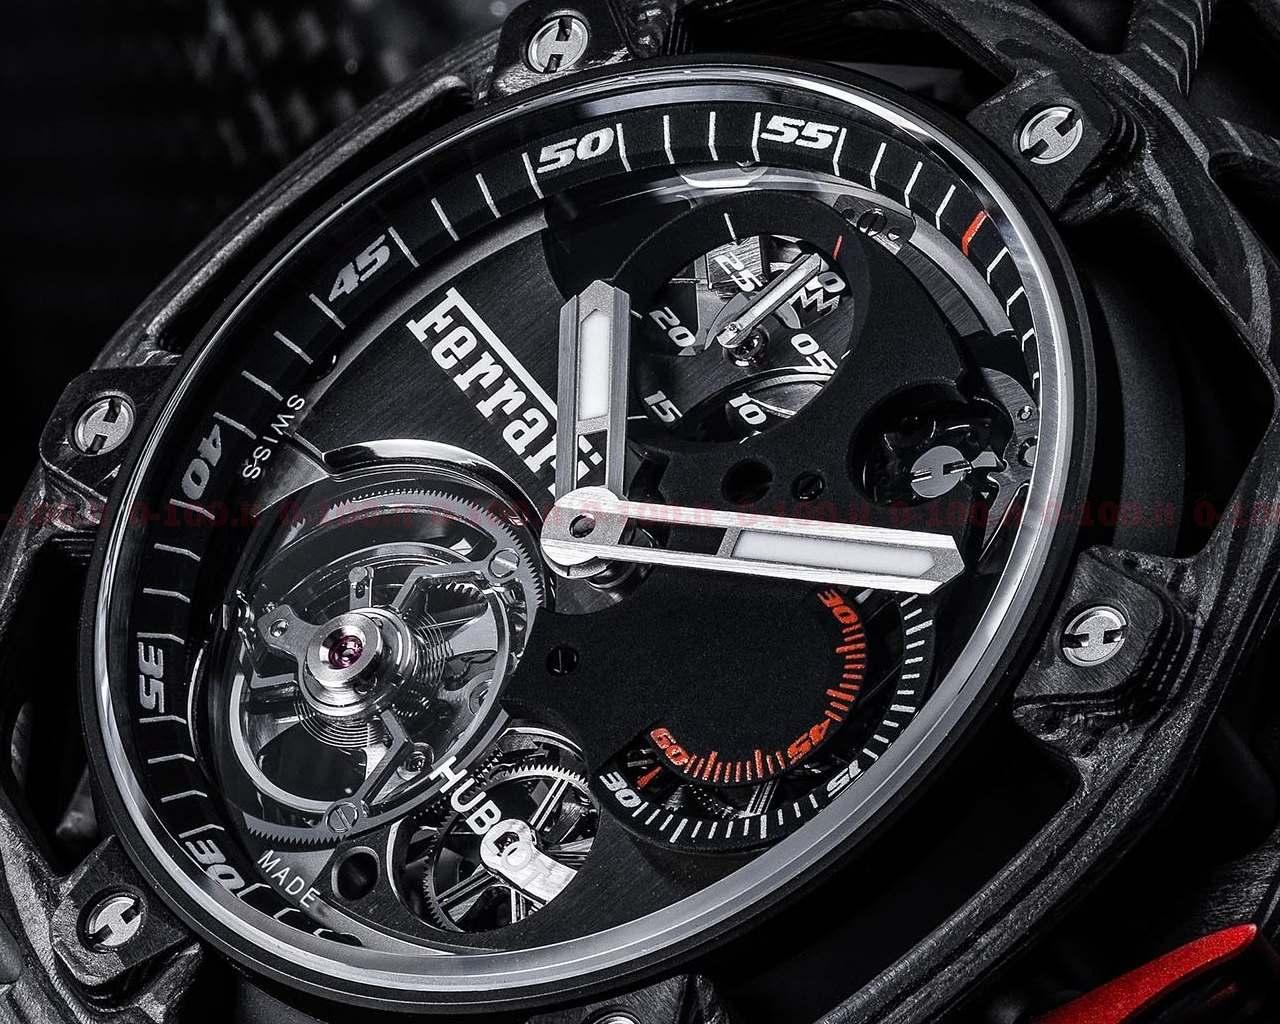 Hublot Techframe Ferrari 70 Years Tourbillon Chronograph Limited Edition_prezzo_price_0-1005